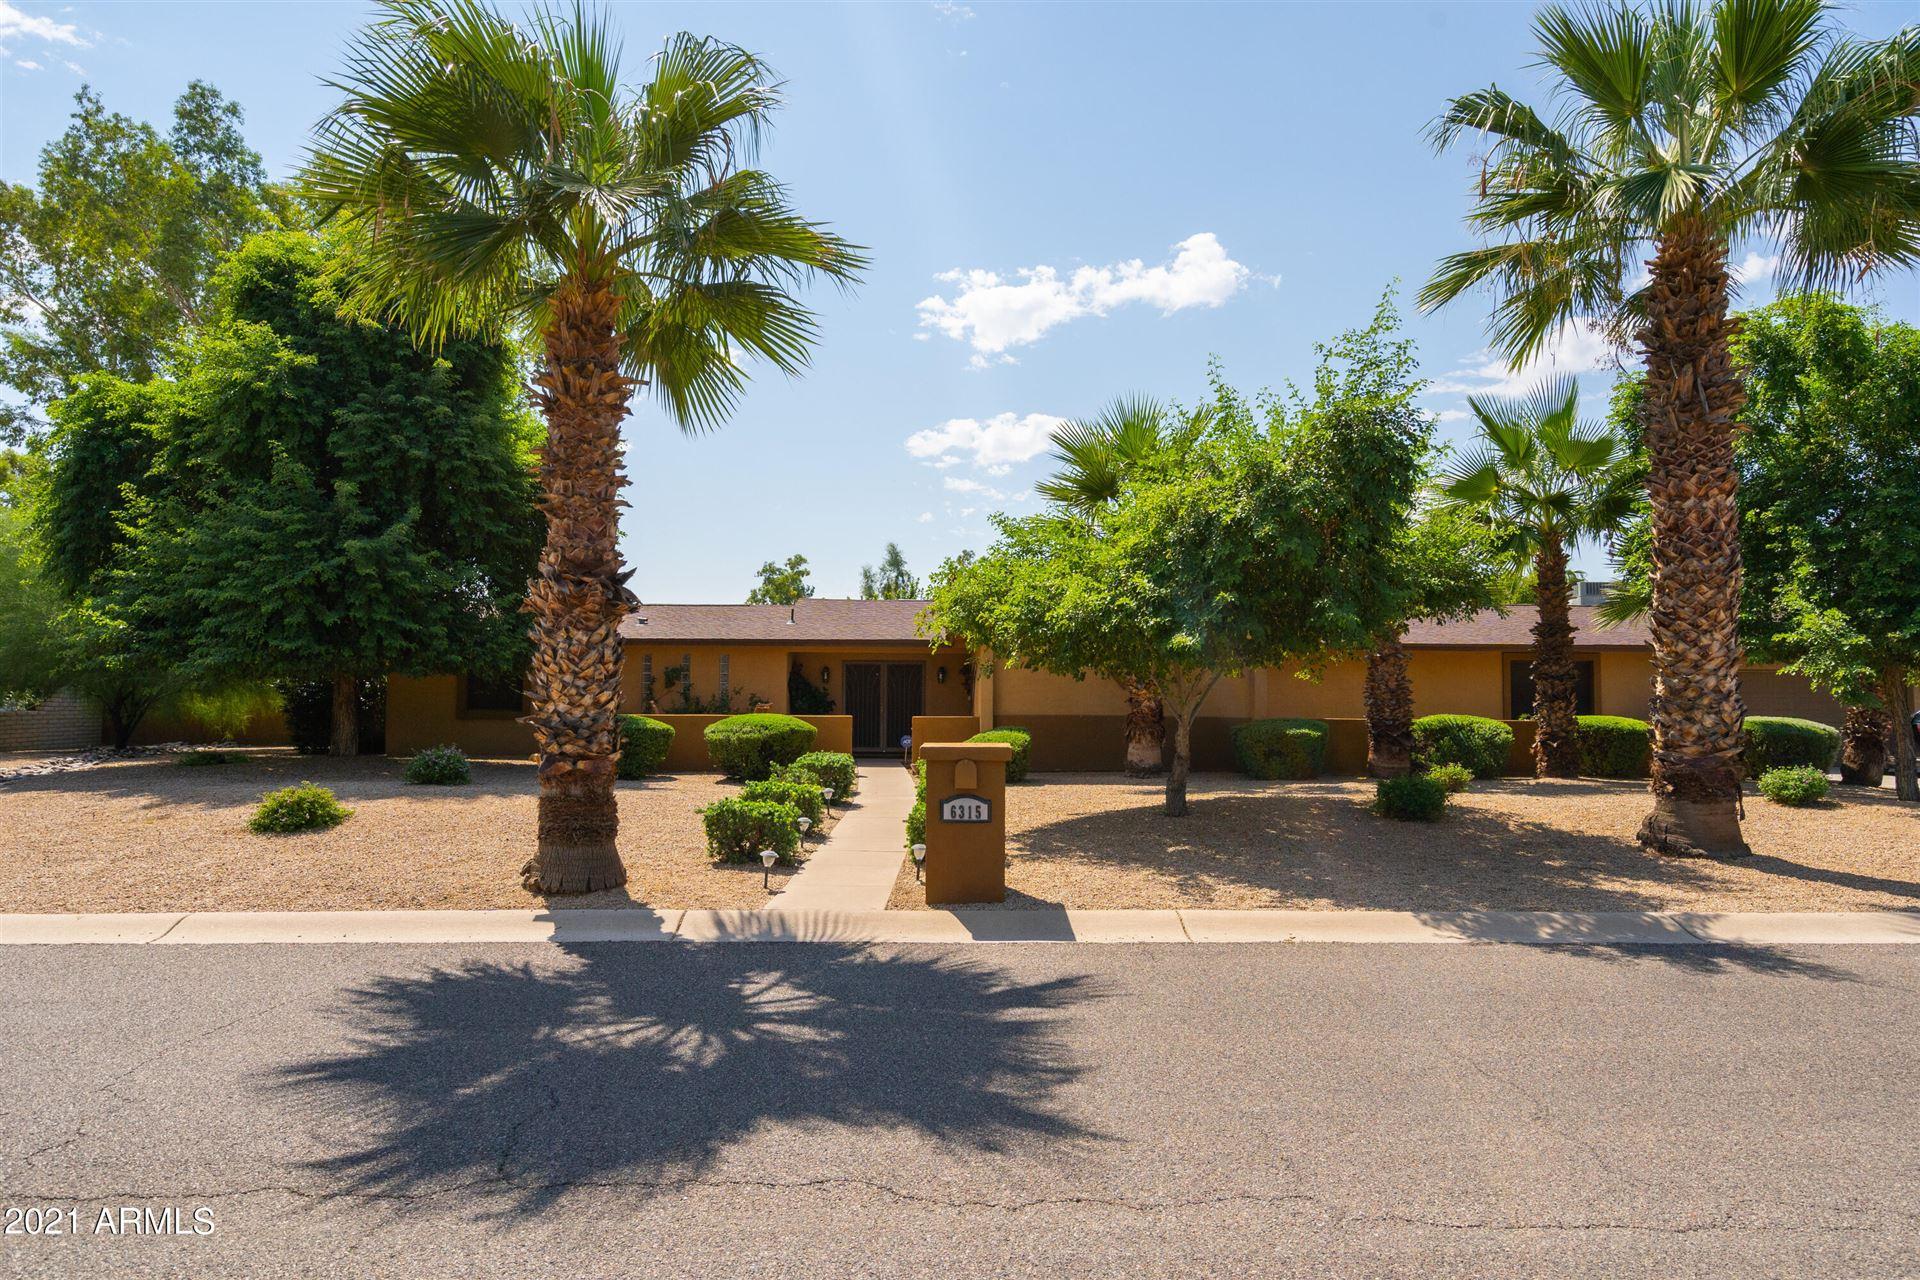 6315 E LARKSPUR Drive, Scottsdale, AZ 85254 - MLS#: 6287628